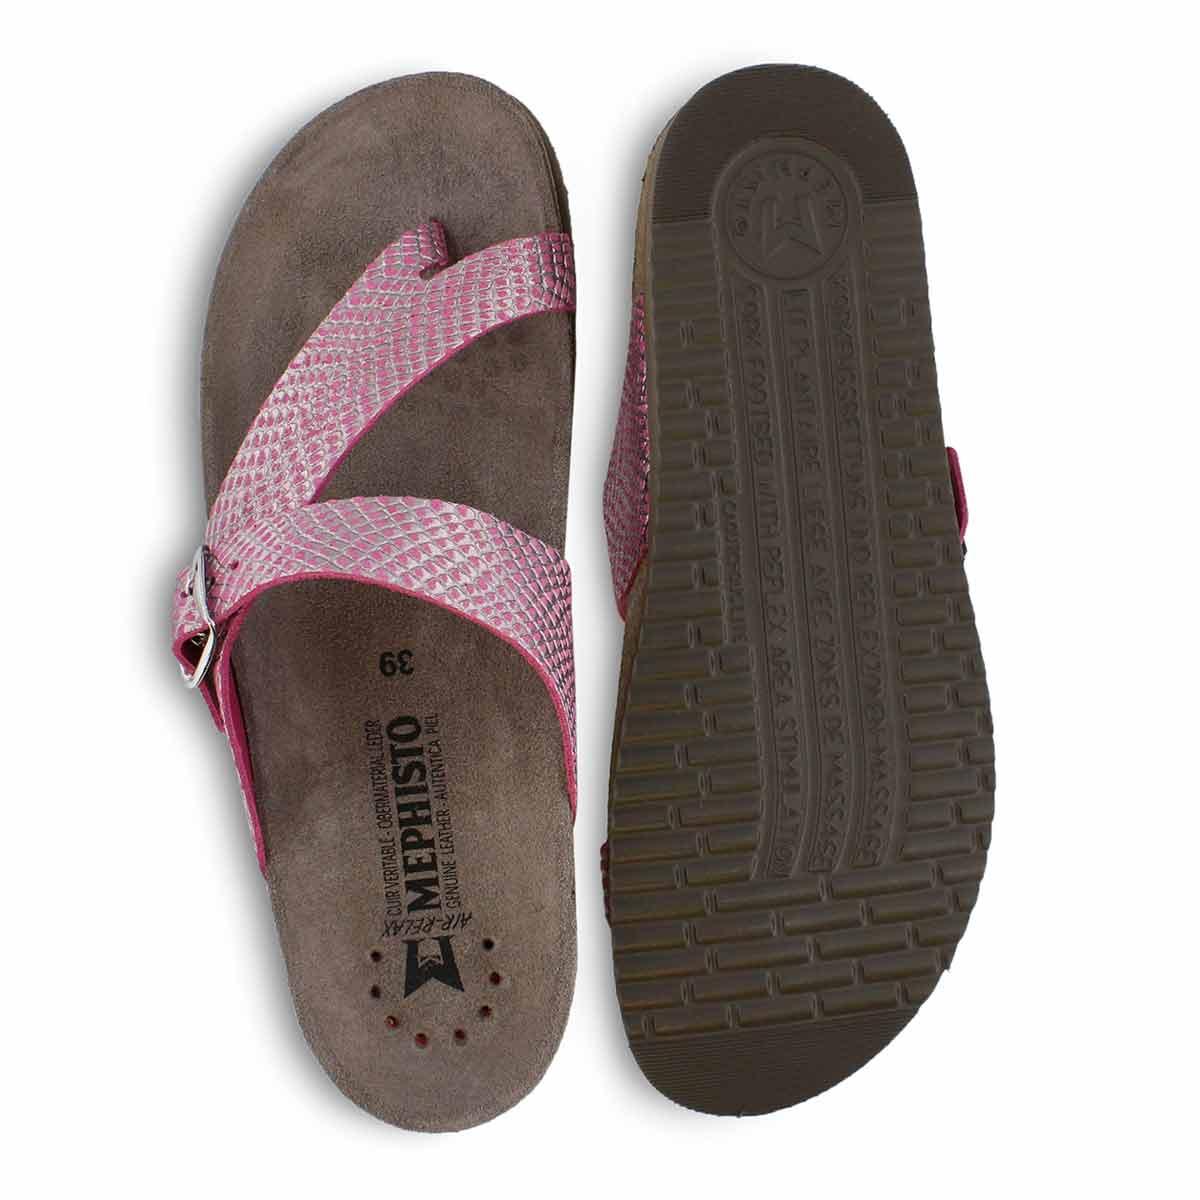 d5a6963102 Mephisto | Sandals | SoftMoc.com